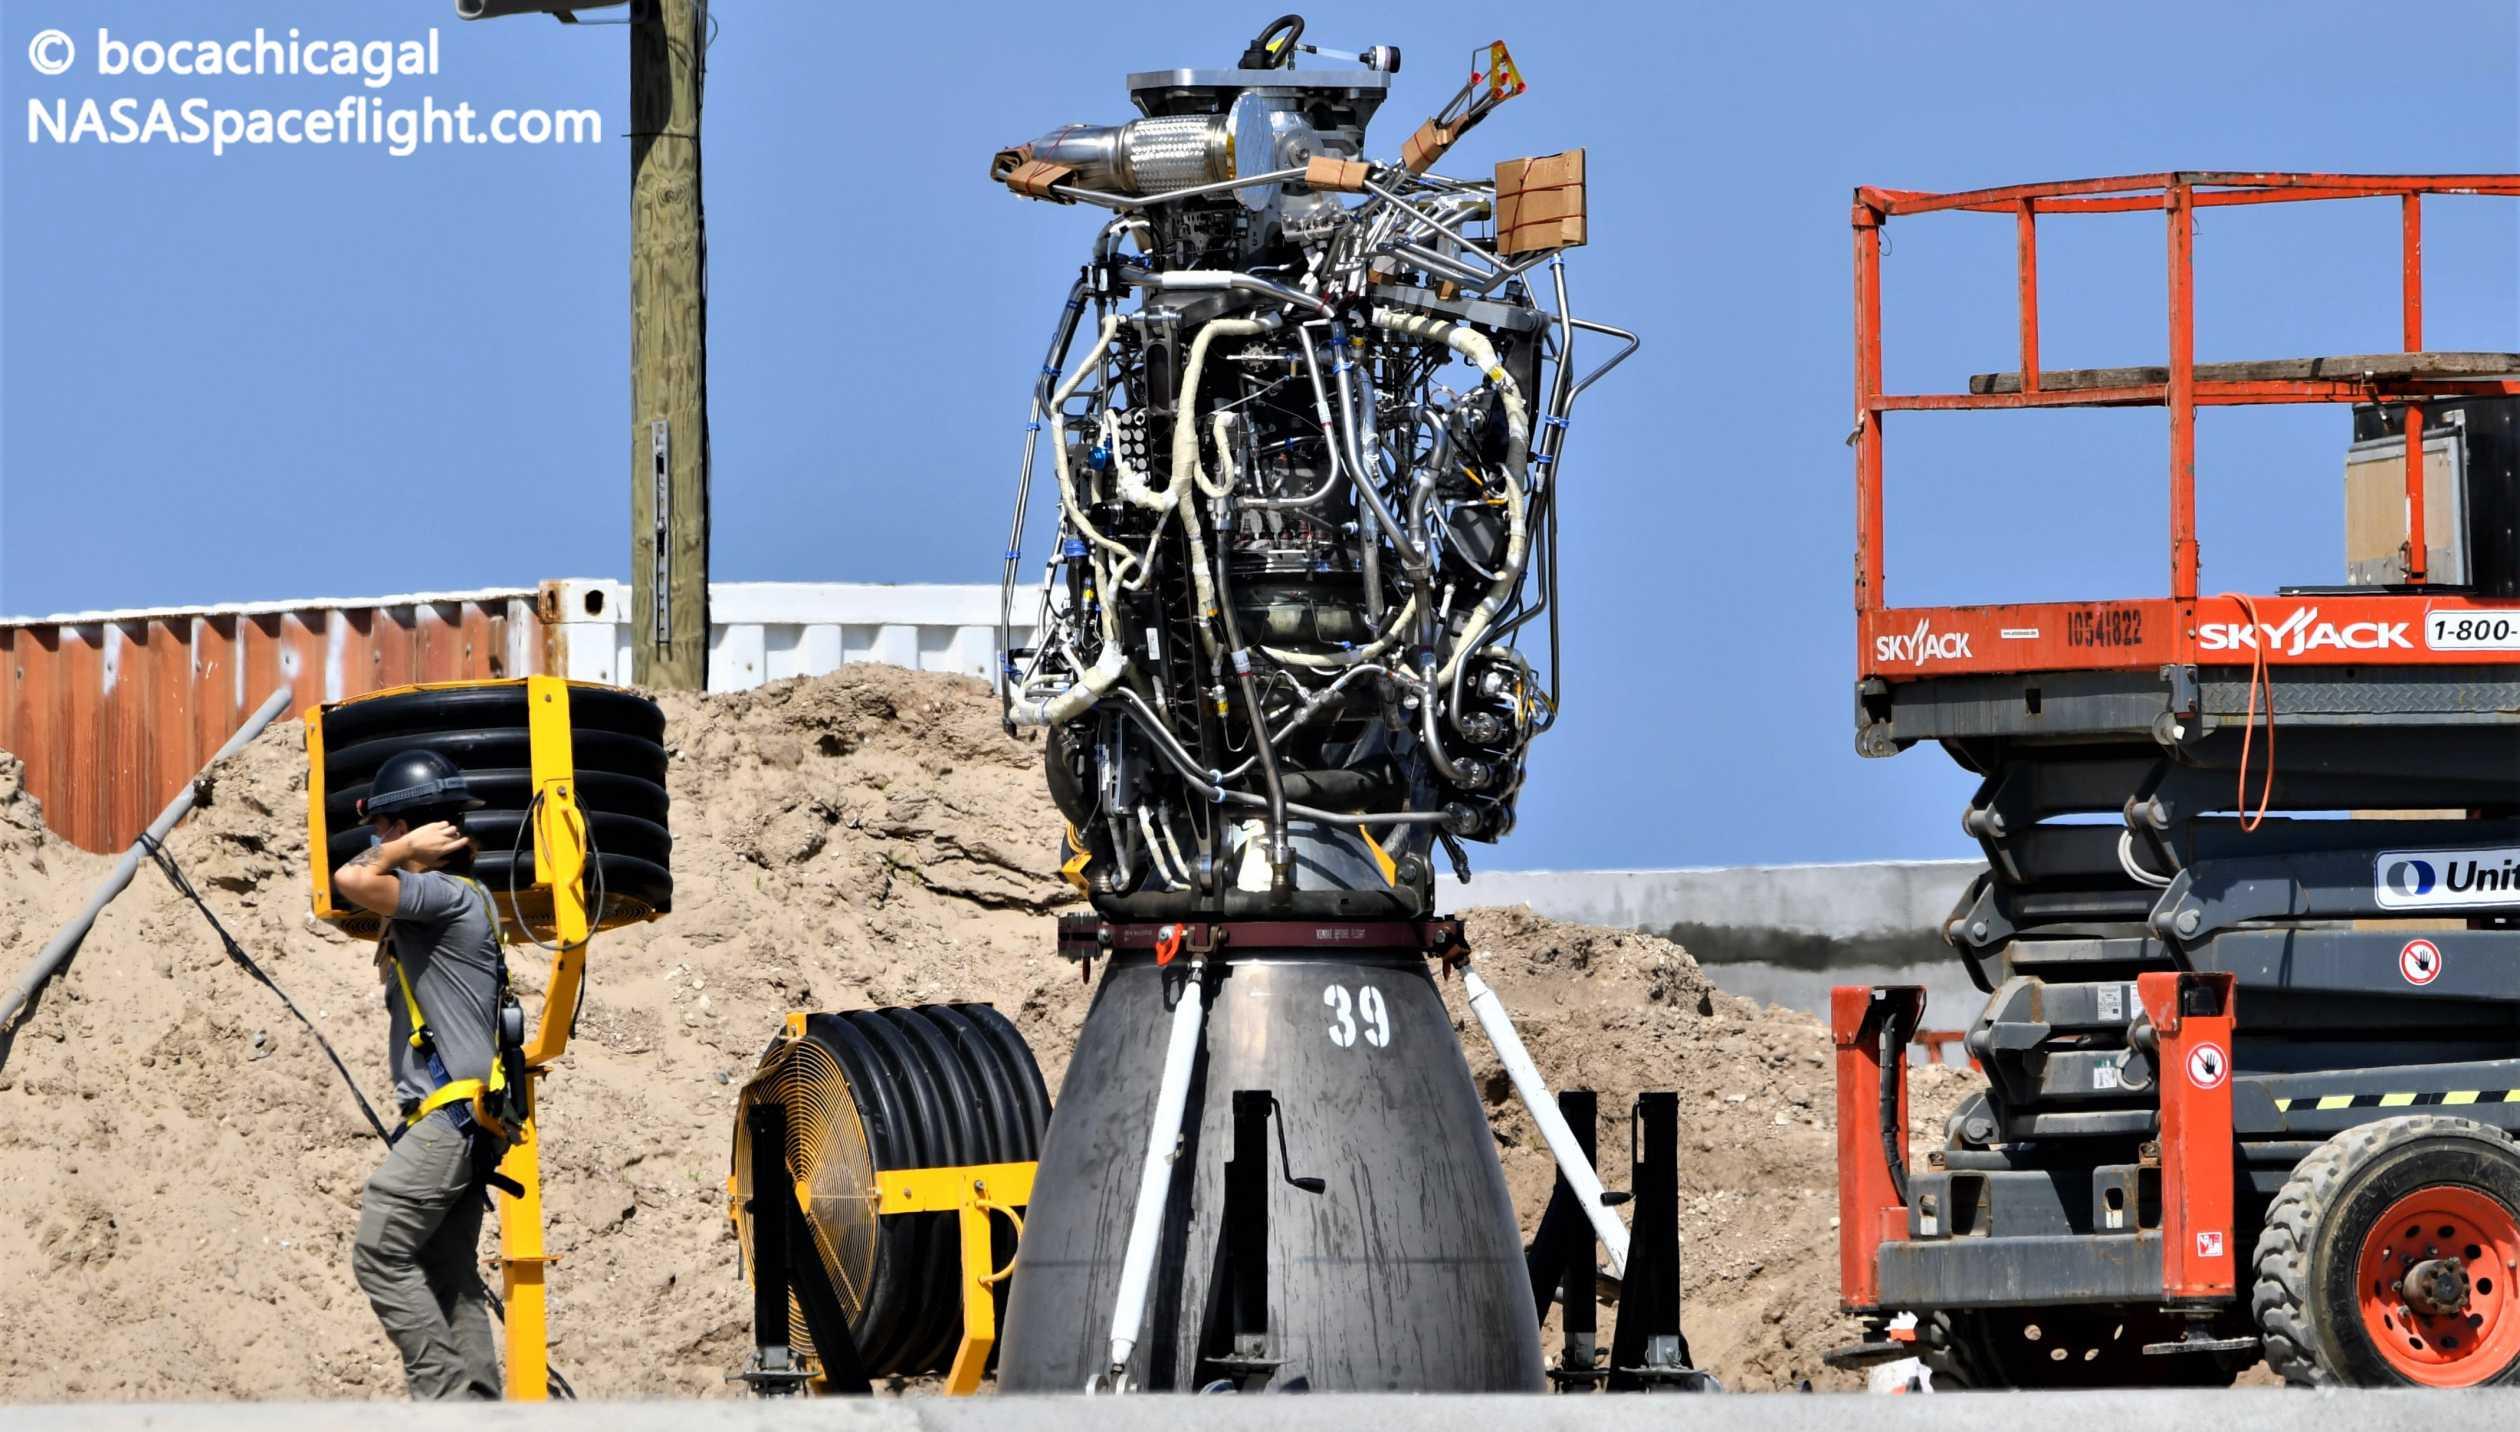 Starship Boca Chica 101120 (NASASpaceflight – bocachicagal) SN8 Raptor SN39 install 1 crop (c)